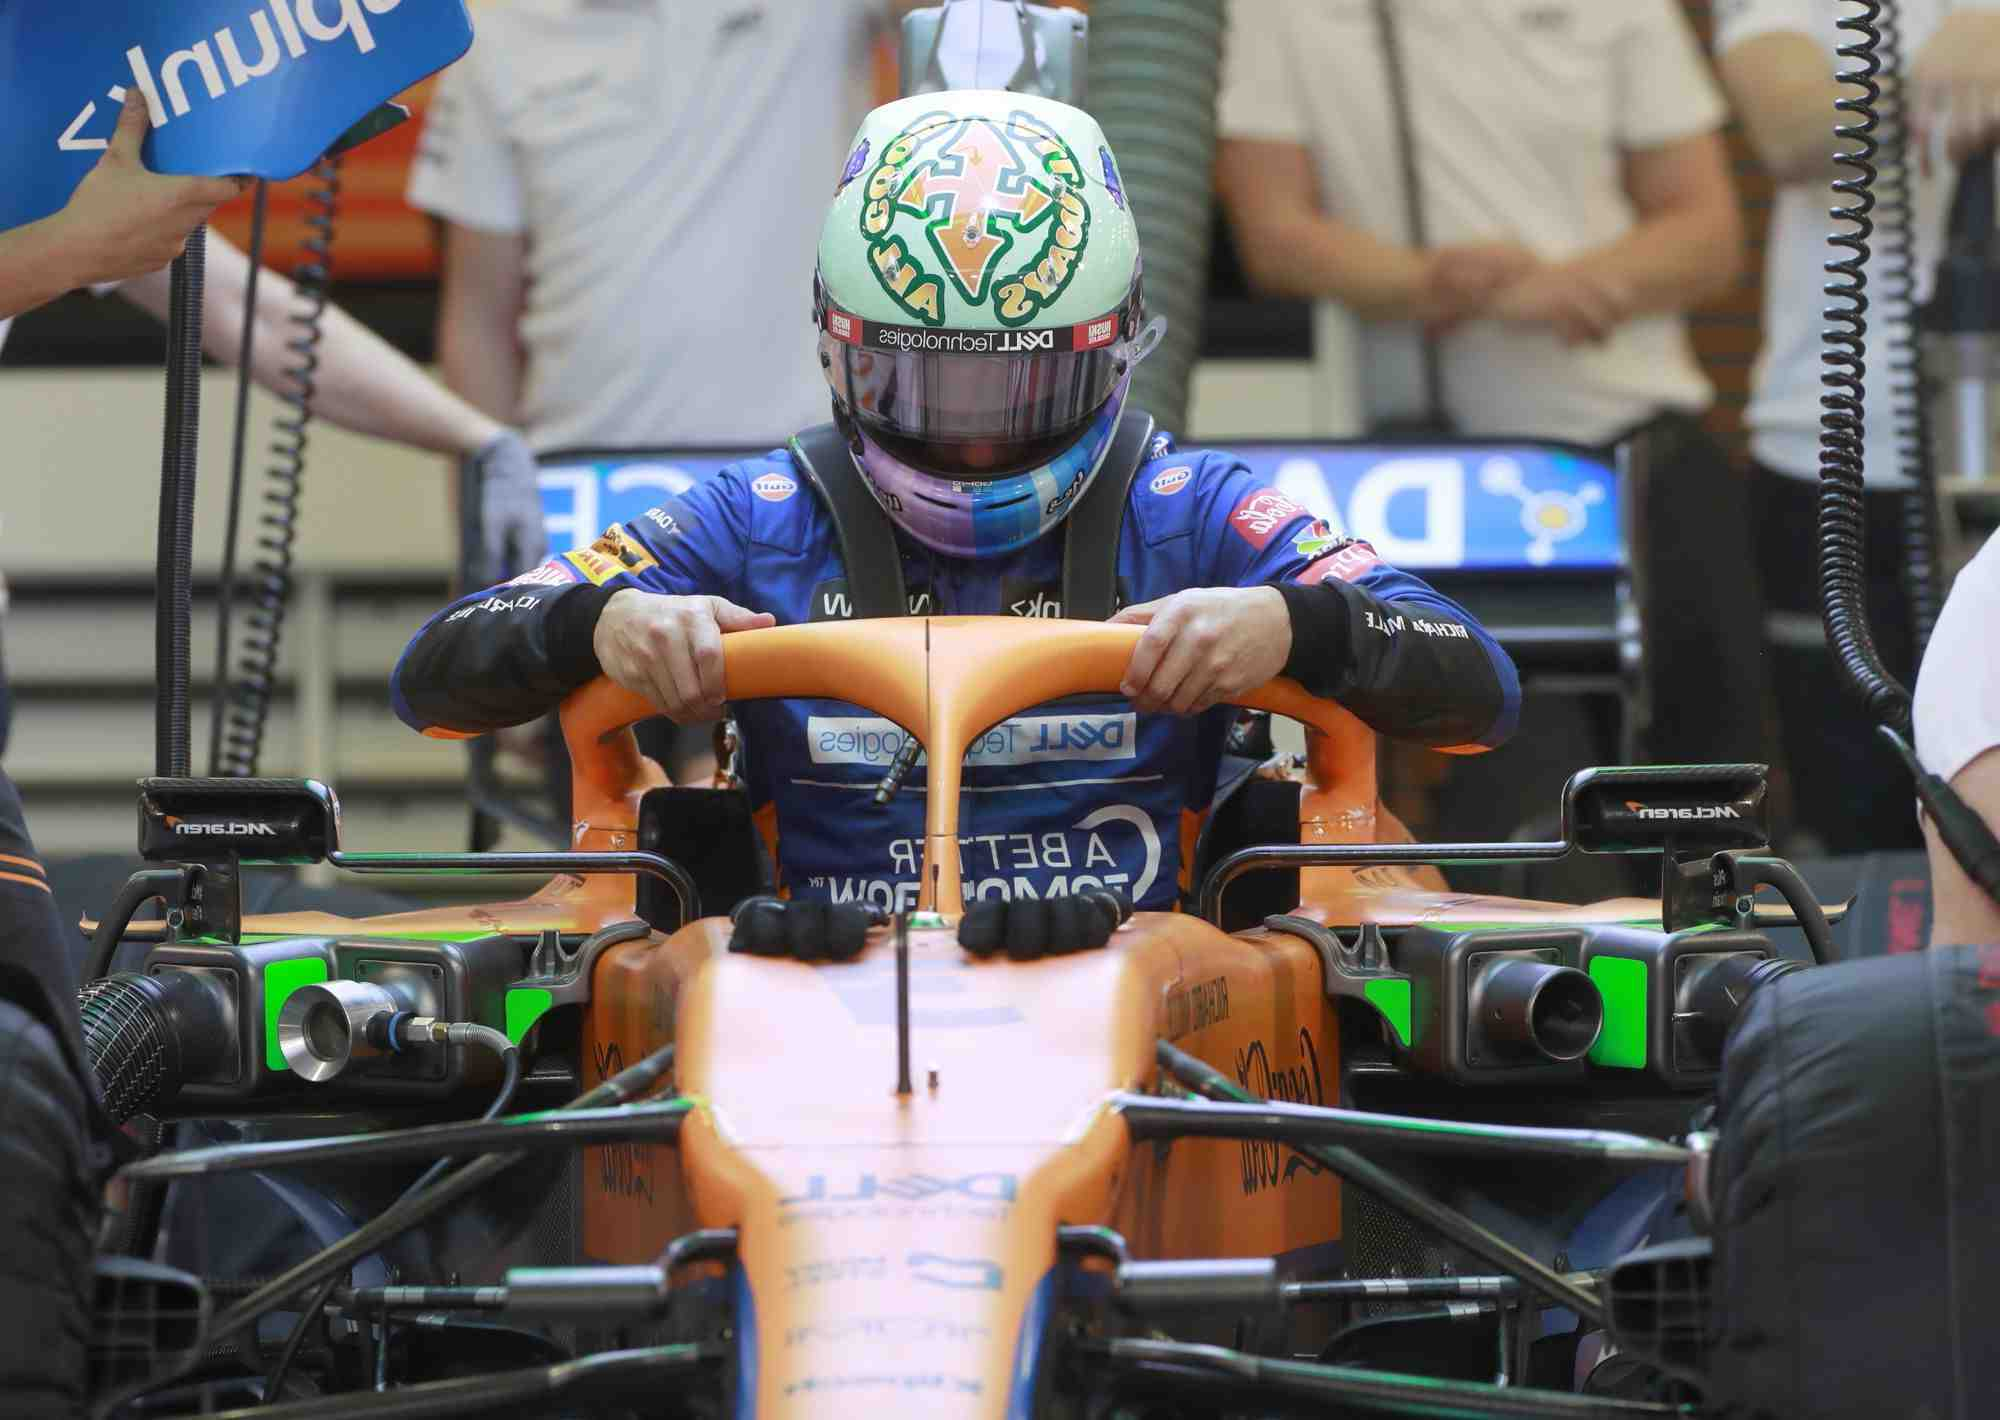 Is Lewis Hamilton better than Schumacher?